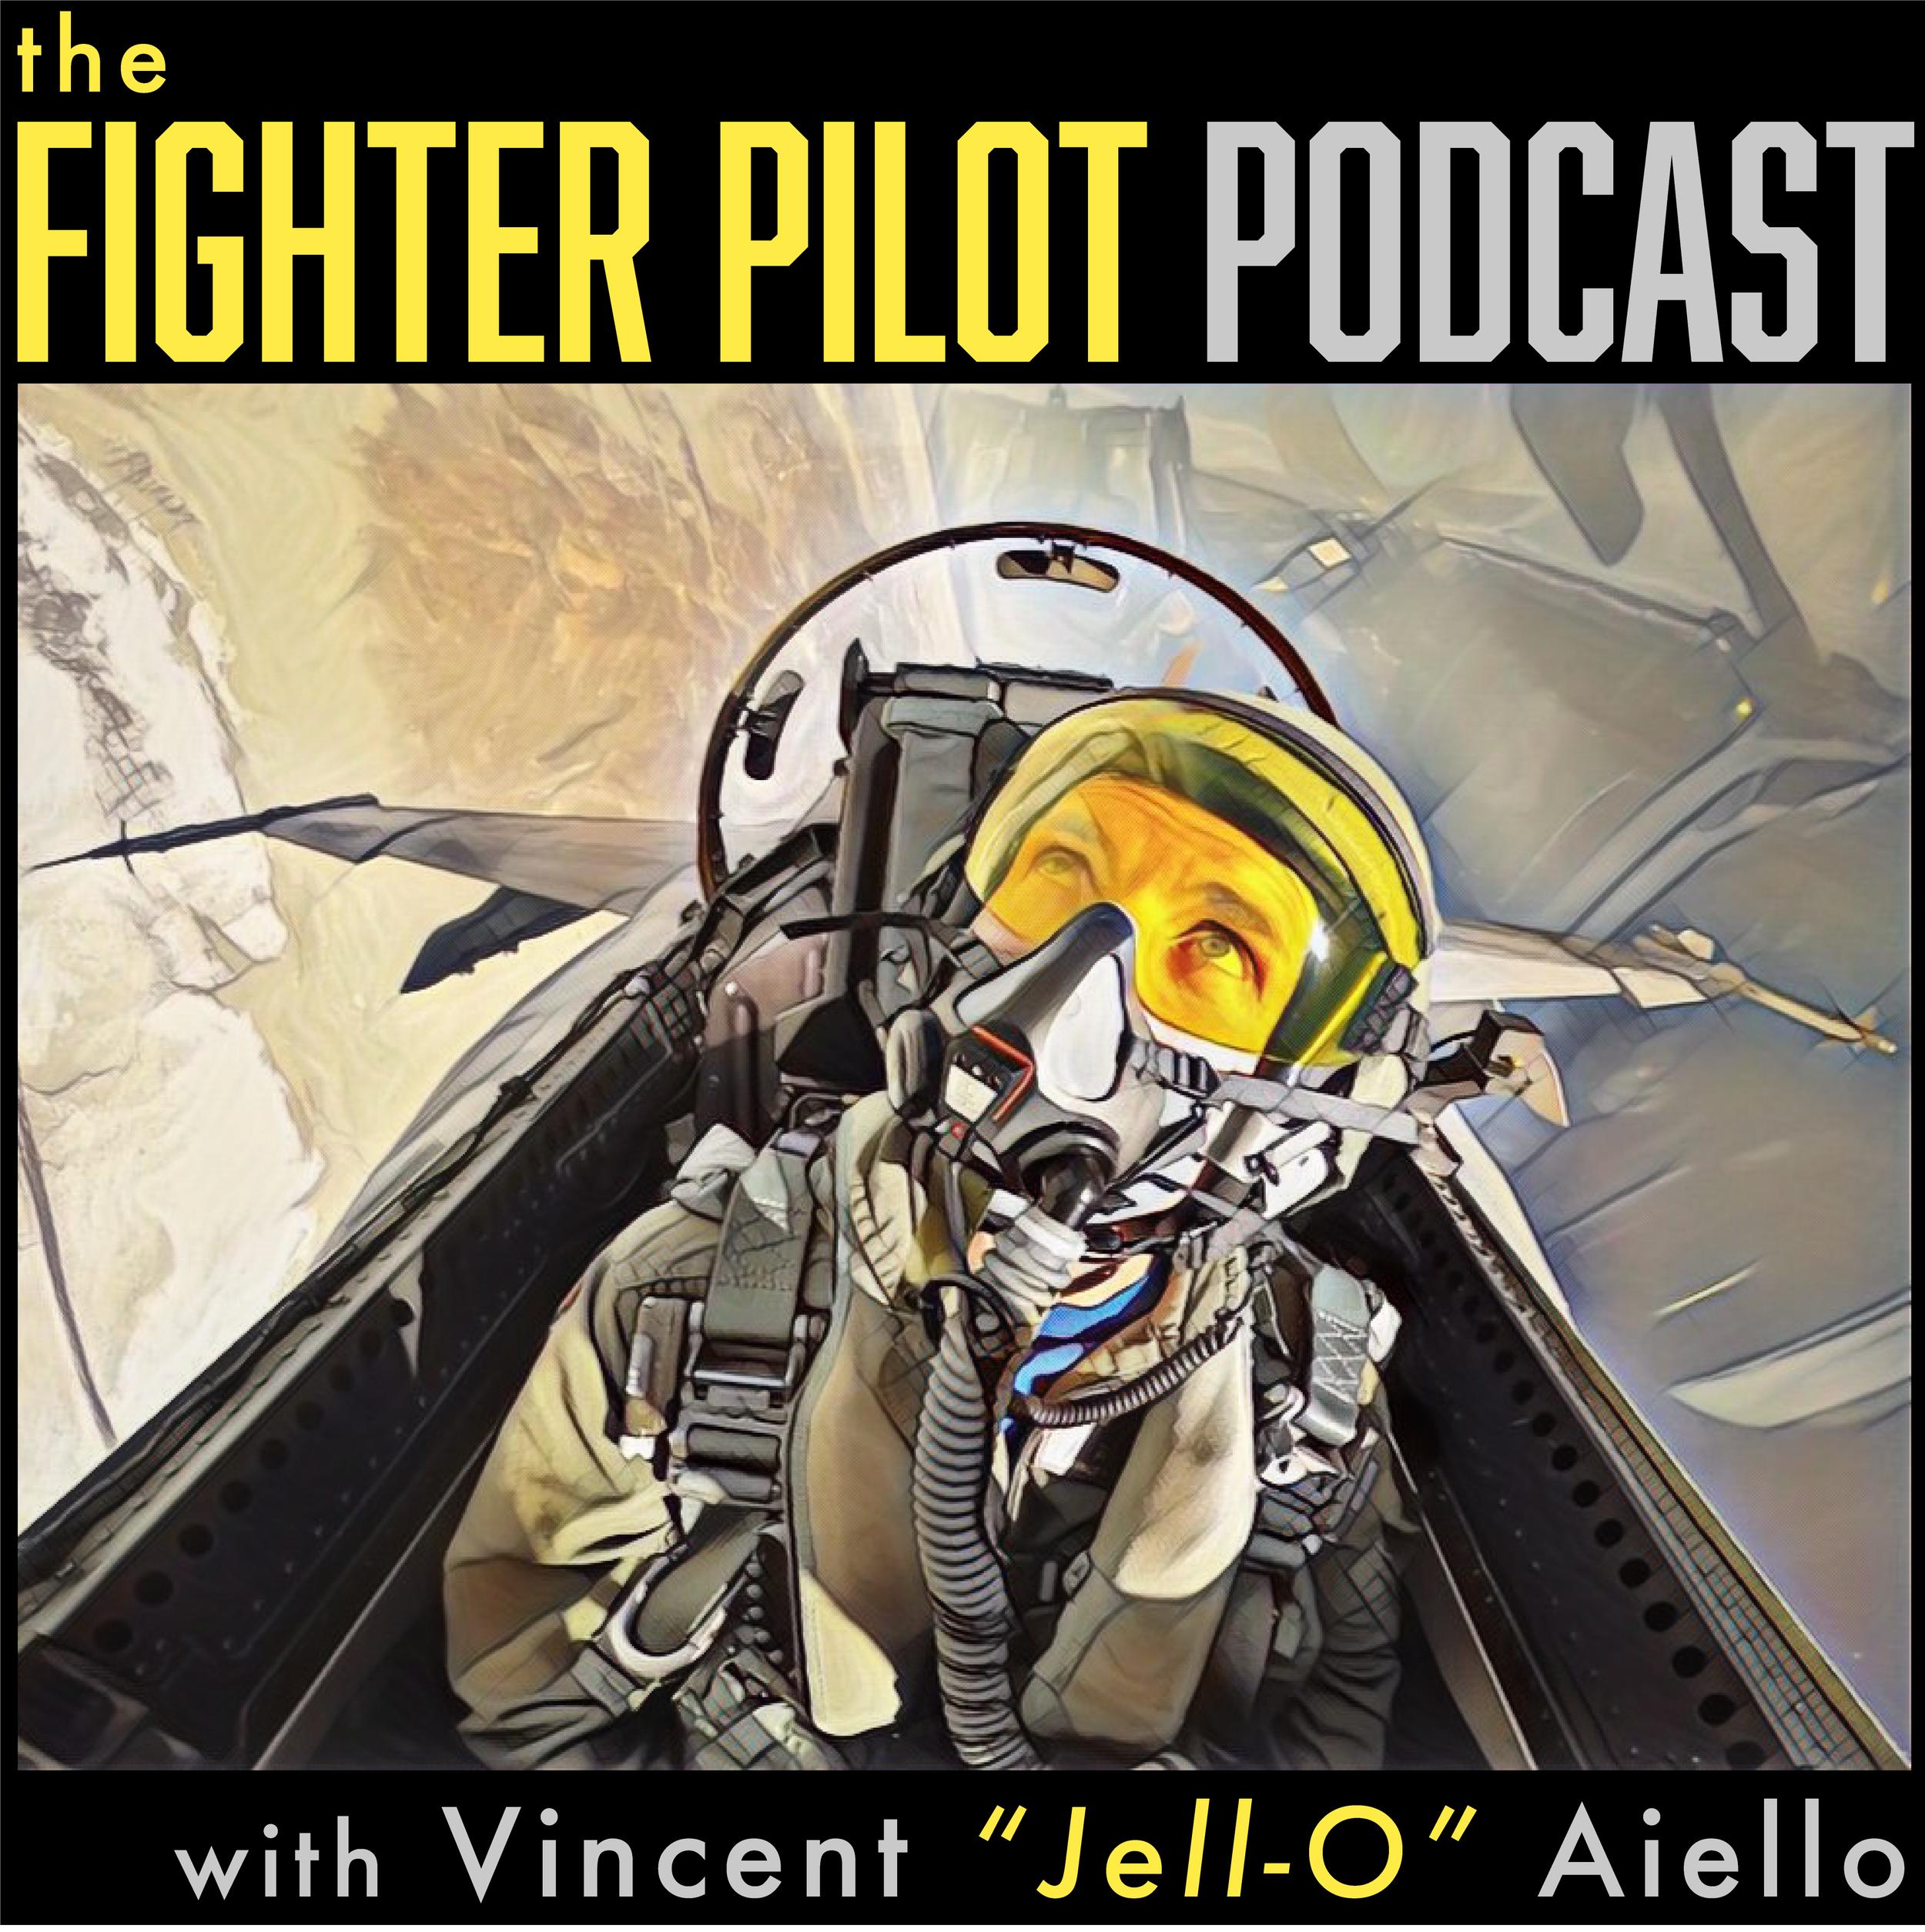 Brand management, including logo design for  The Fighter Pilot Podcast